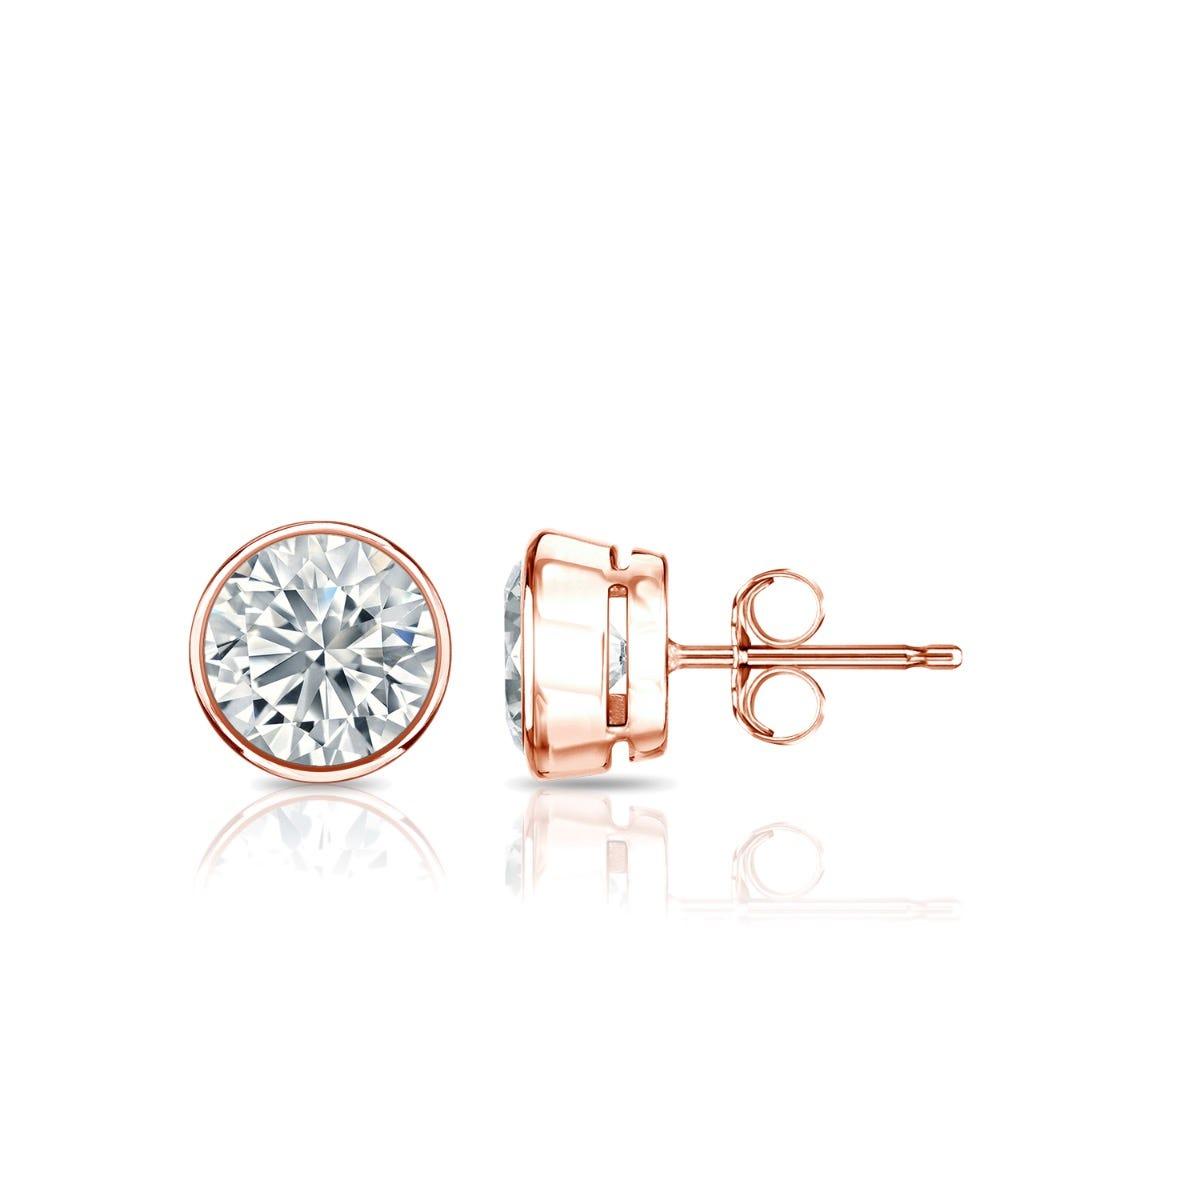 Diamond Round Bezel-Set 3/4ctw. Solitaire Stud (IJ-VS2) Earrings in 14K Rose Gold